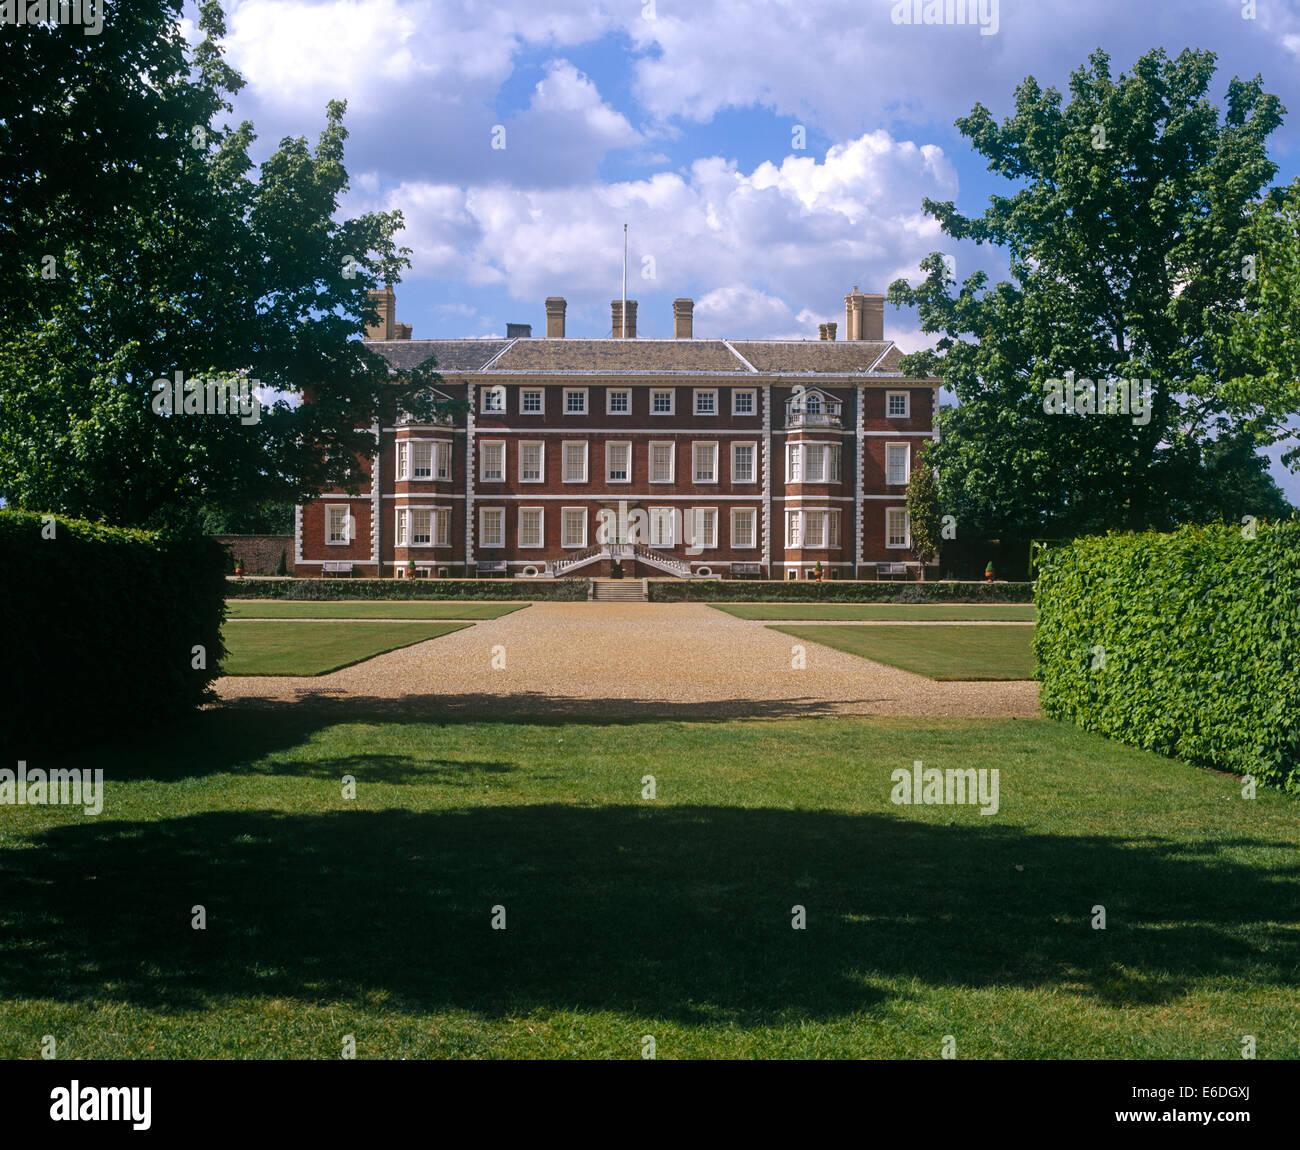 Schinken Haus Petersham Surrey uk Stockbild